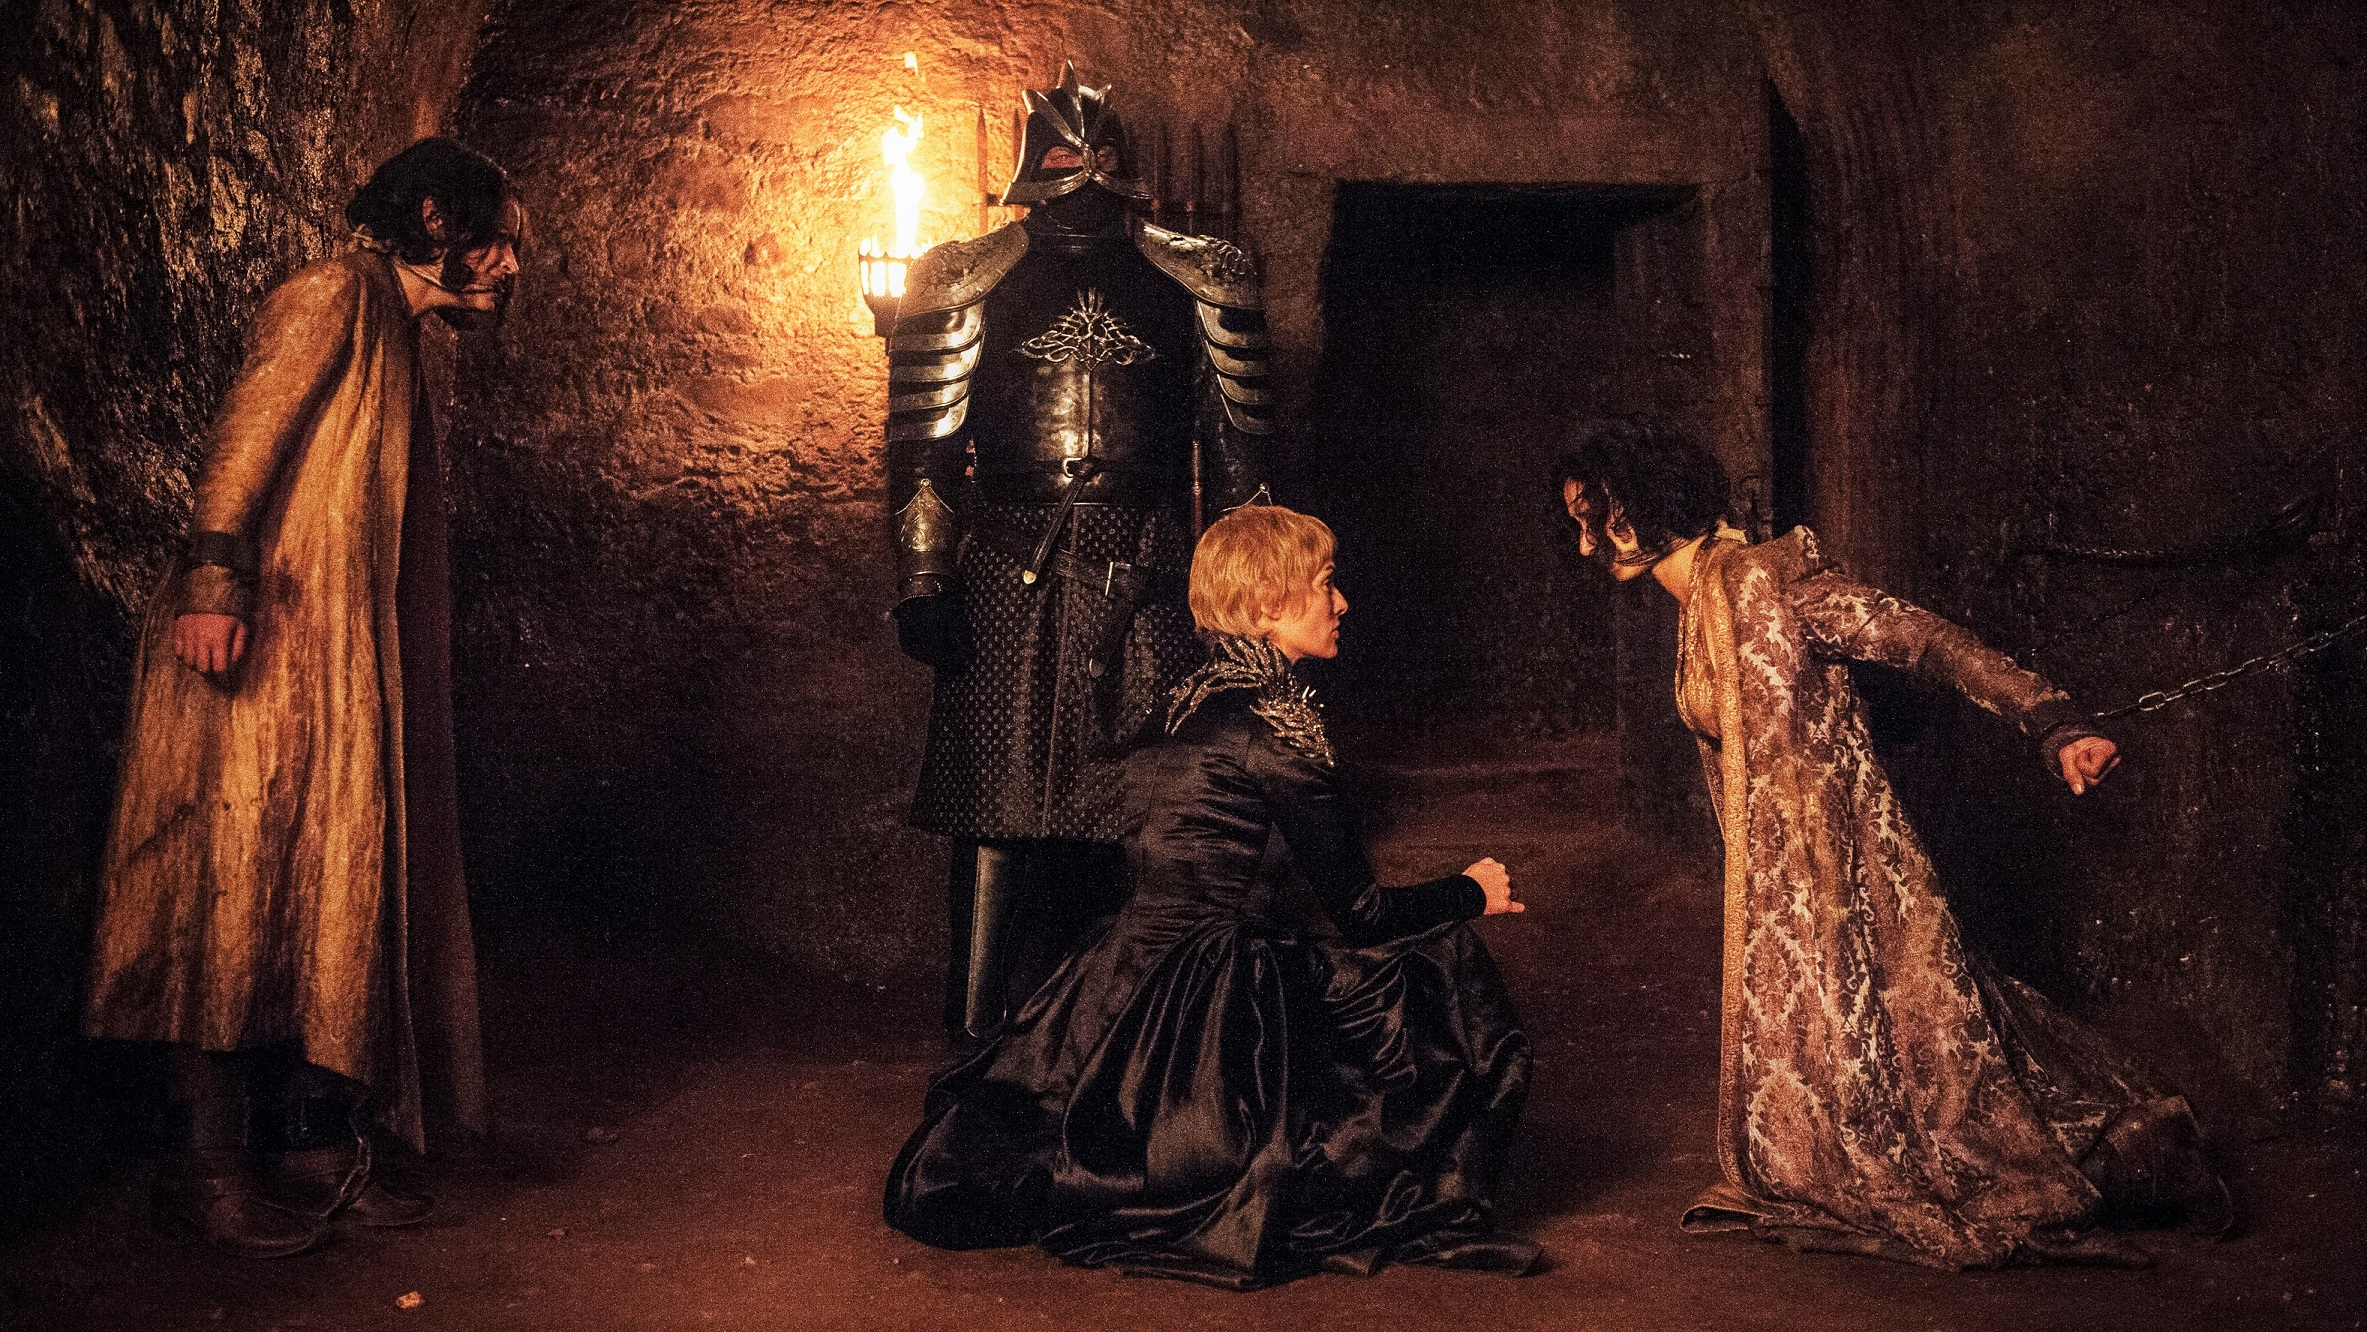 703 - King's Landing - Cersei, Gregor, Ellaria, Tyene 1